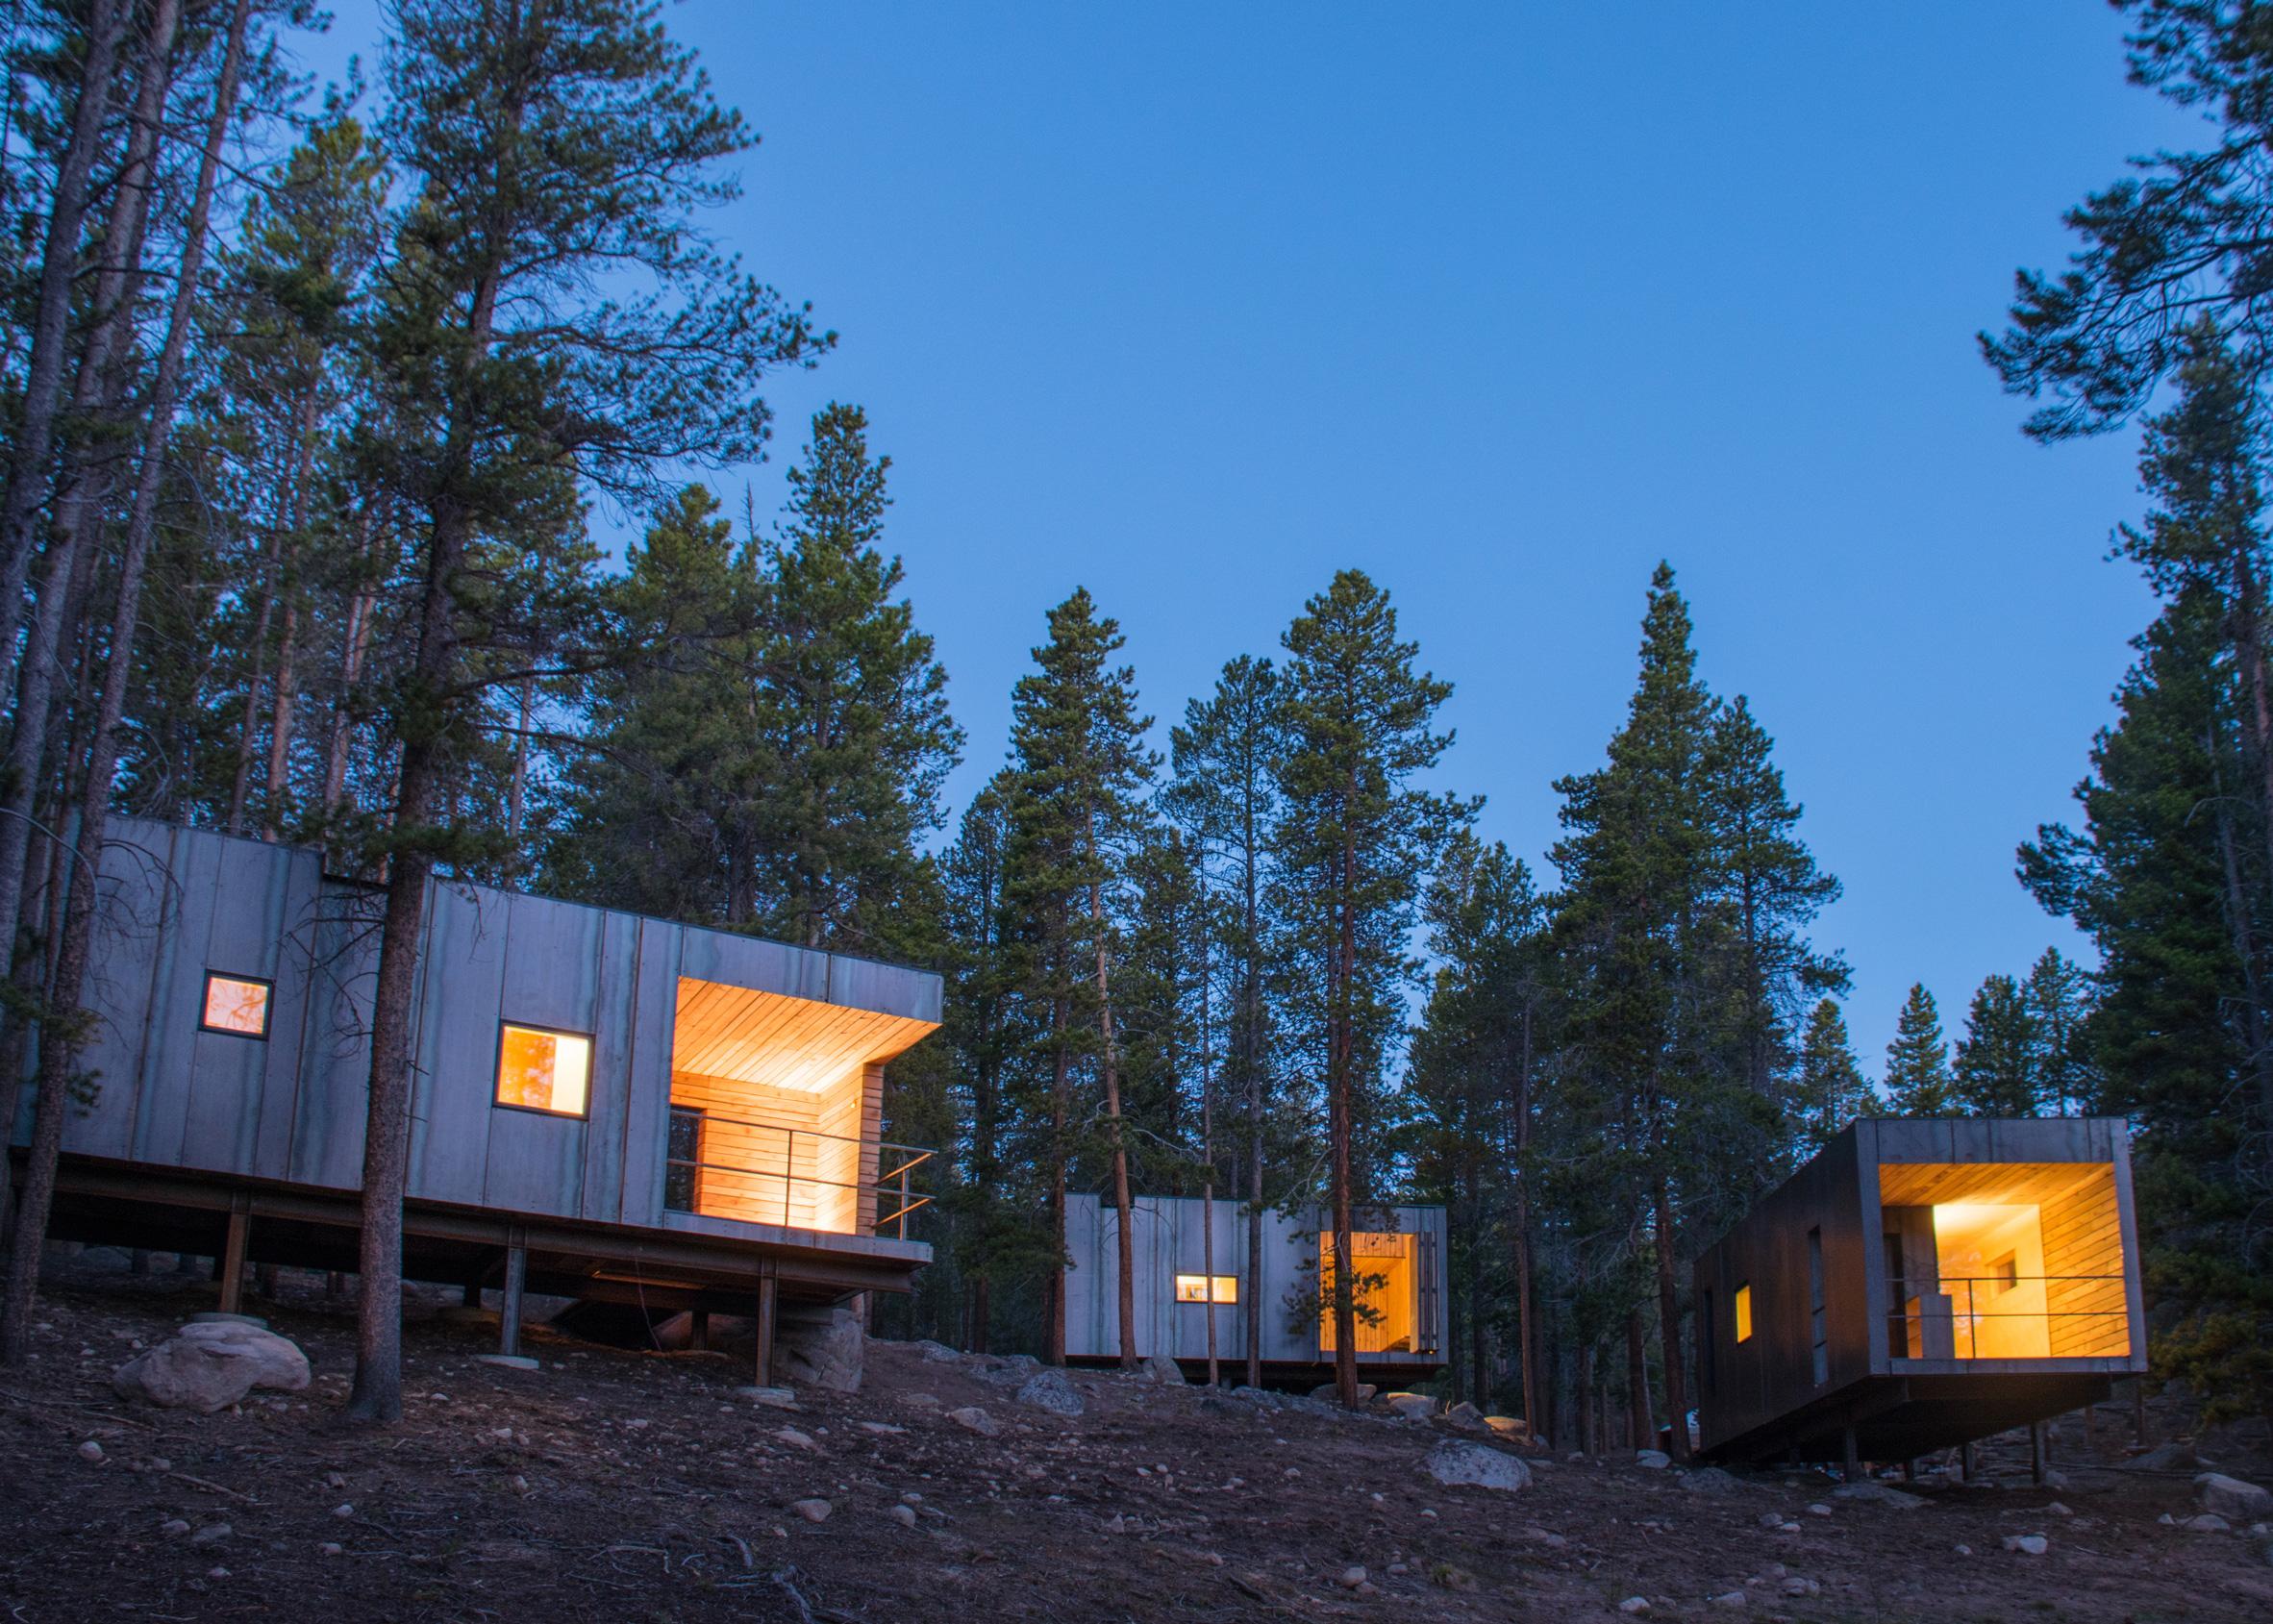 Colorado Outward Bound Micro Cabins, Leadville, Colorado, by University of Colorado, College of Architecture and Planning, Colorado Building Workshop